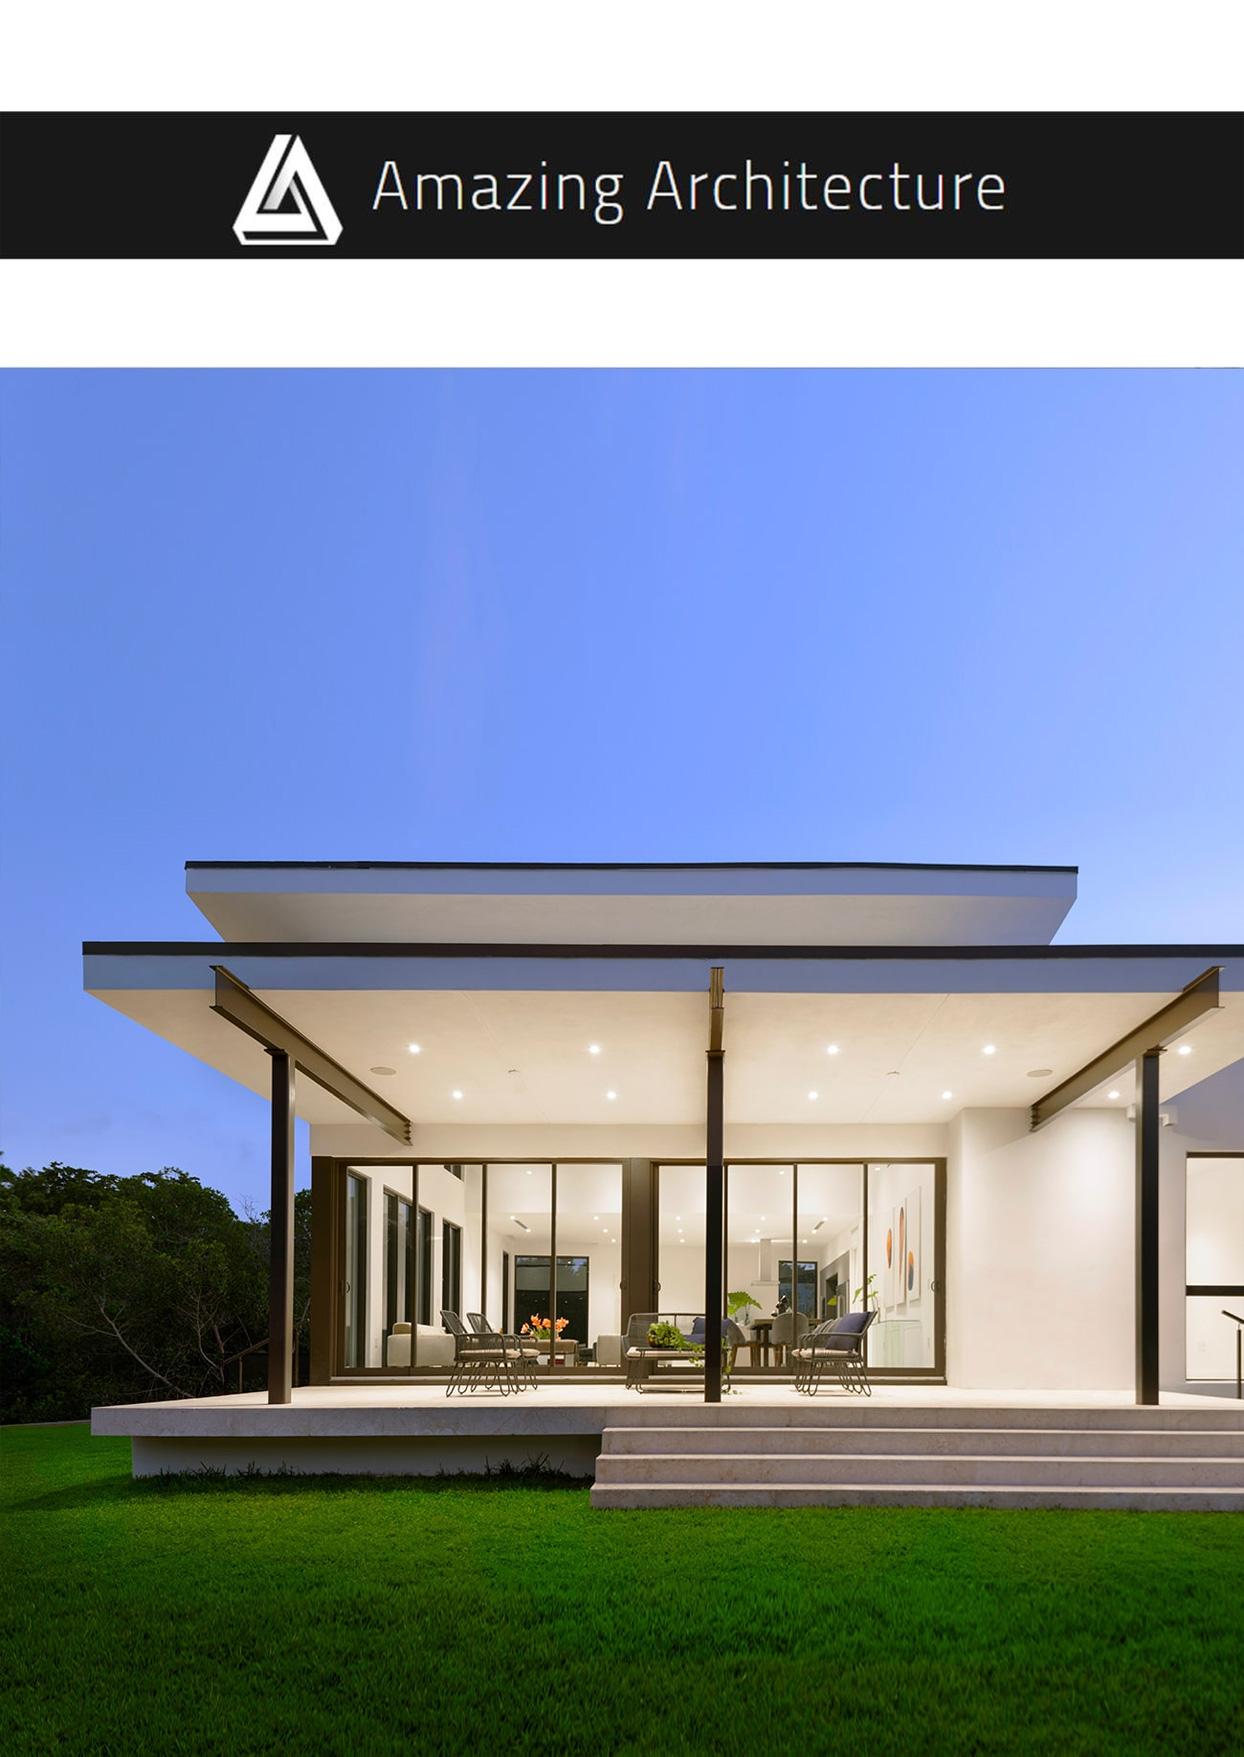 amazing architecture 2020